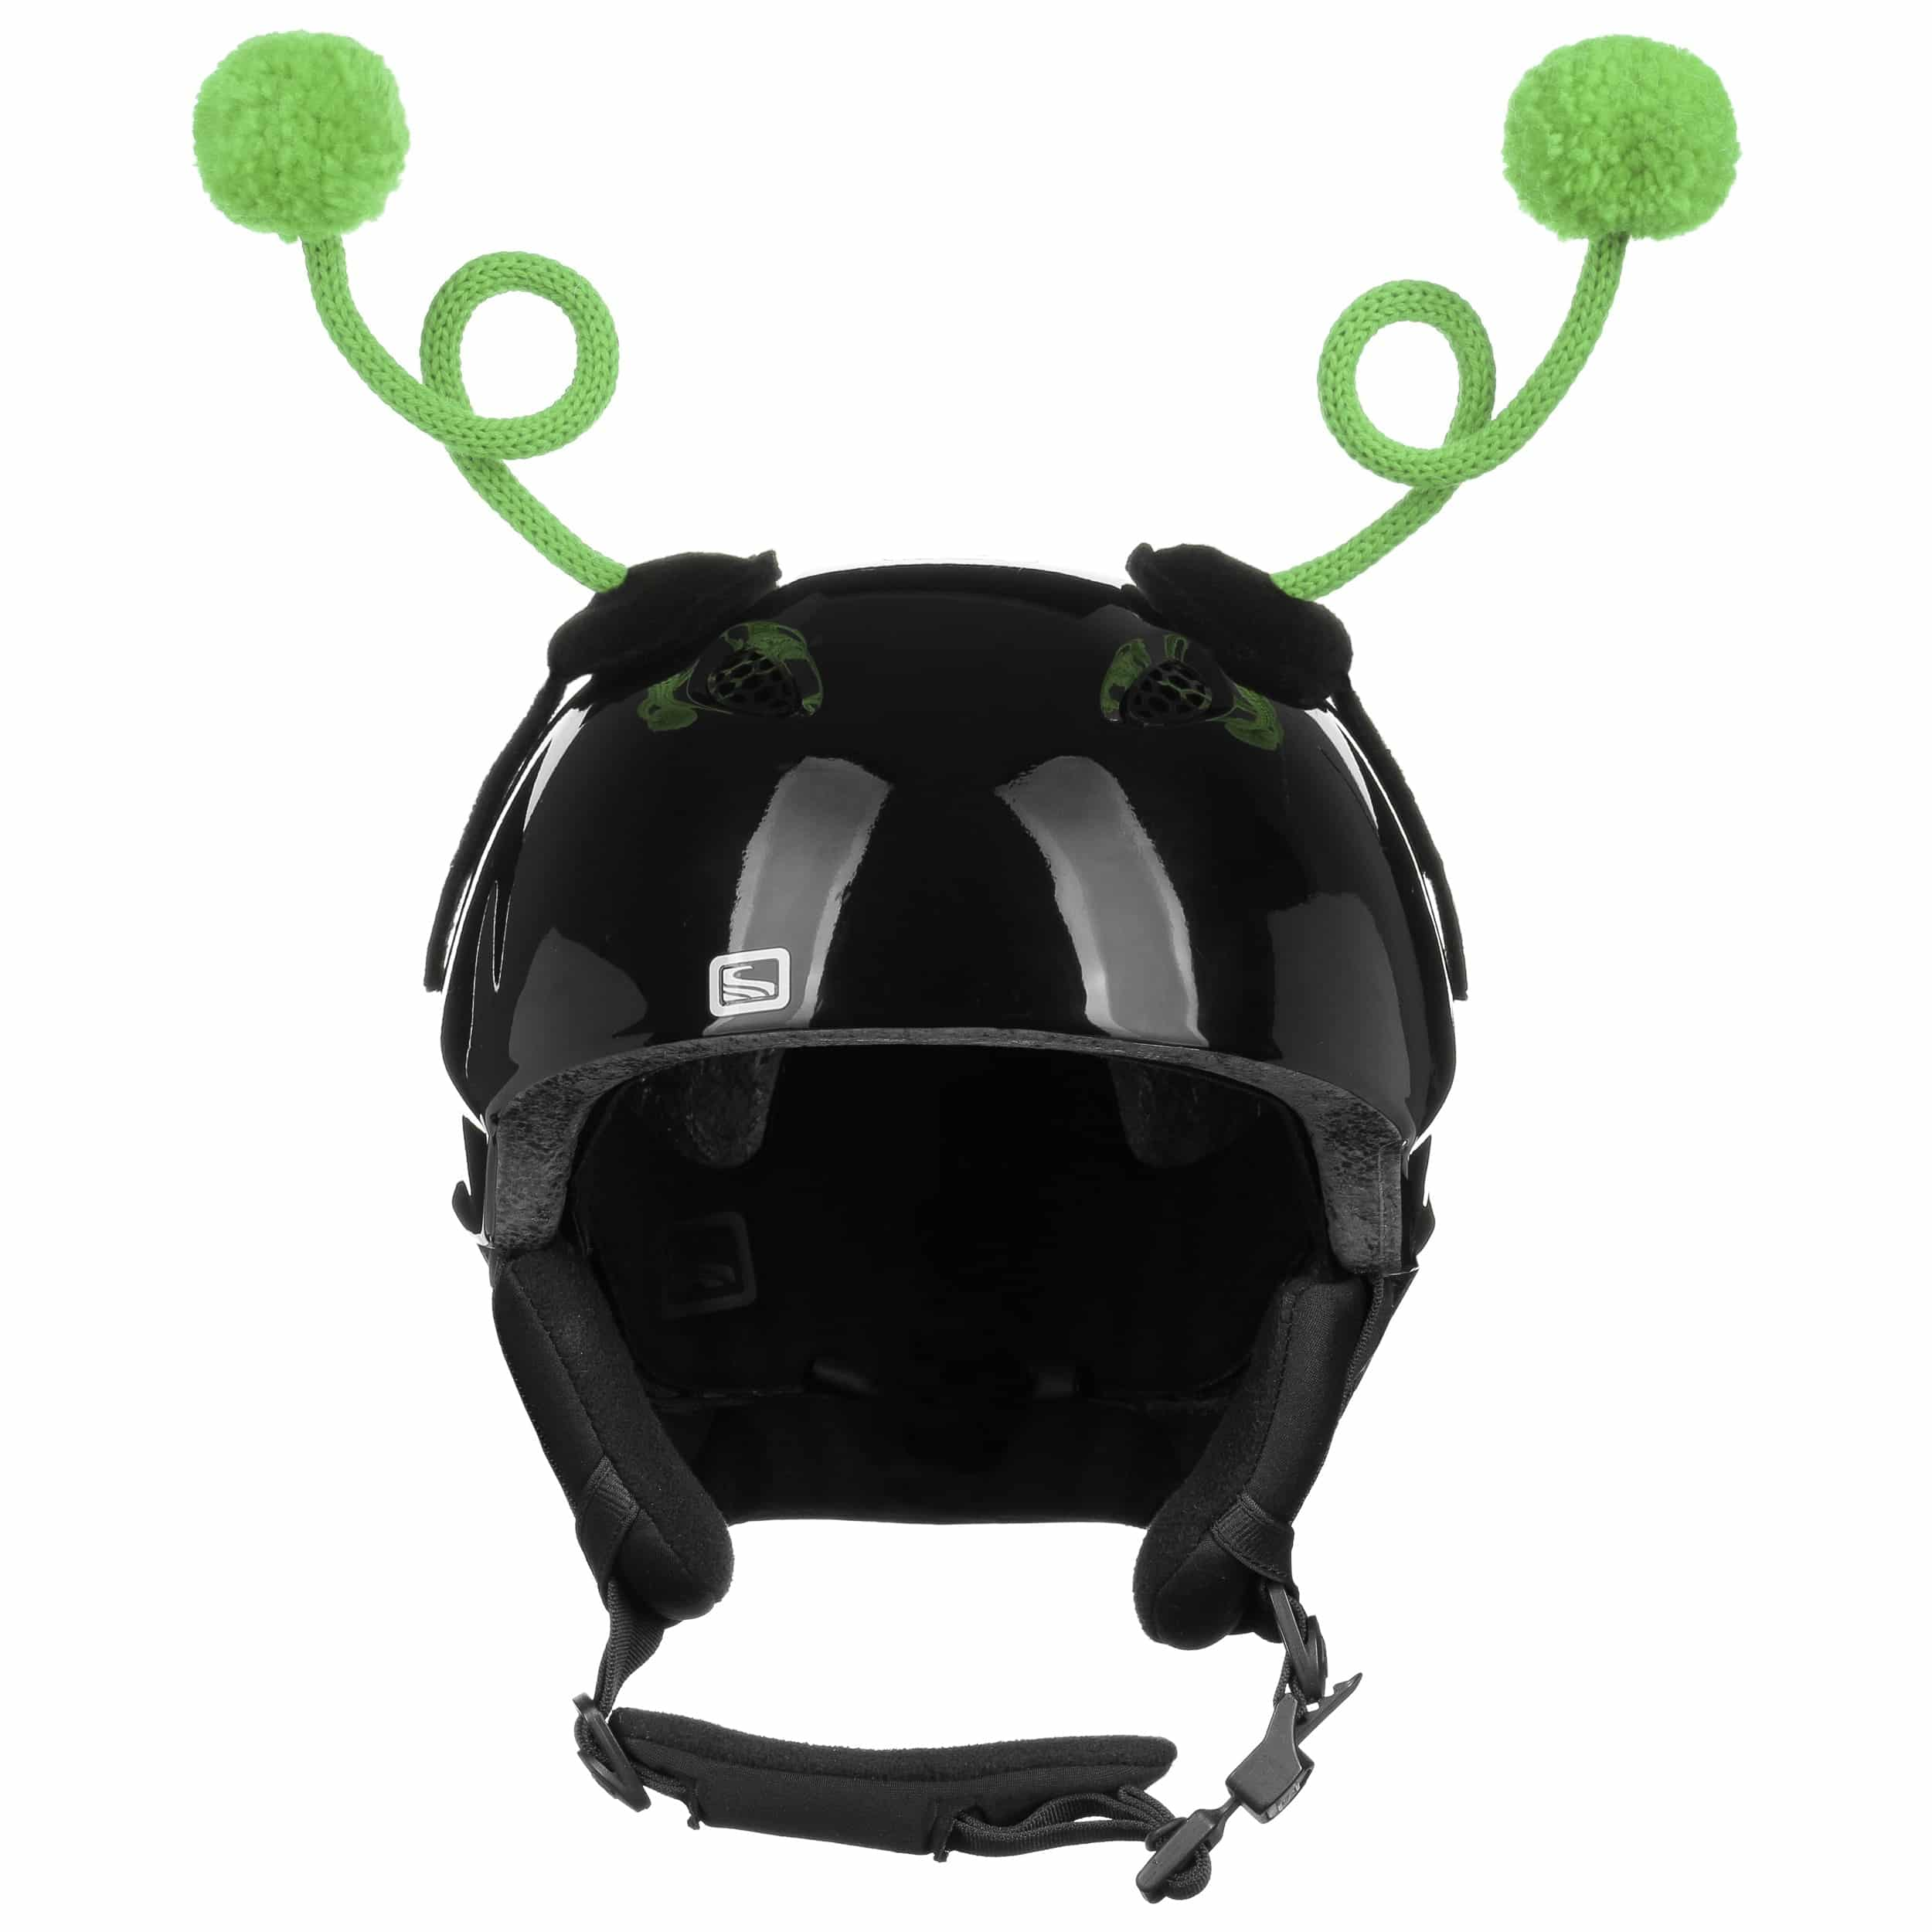 Ping pong helmet sticker